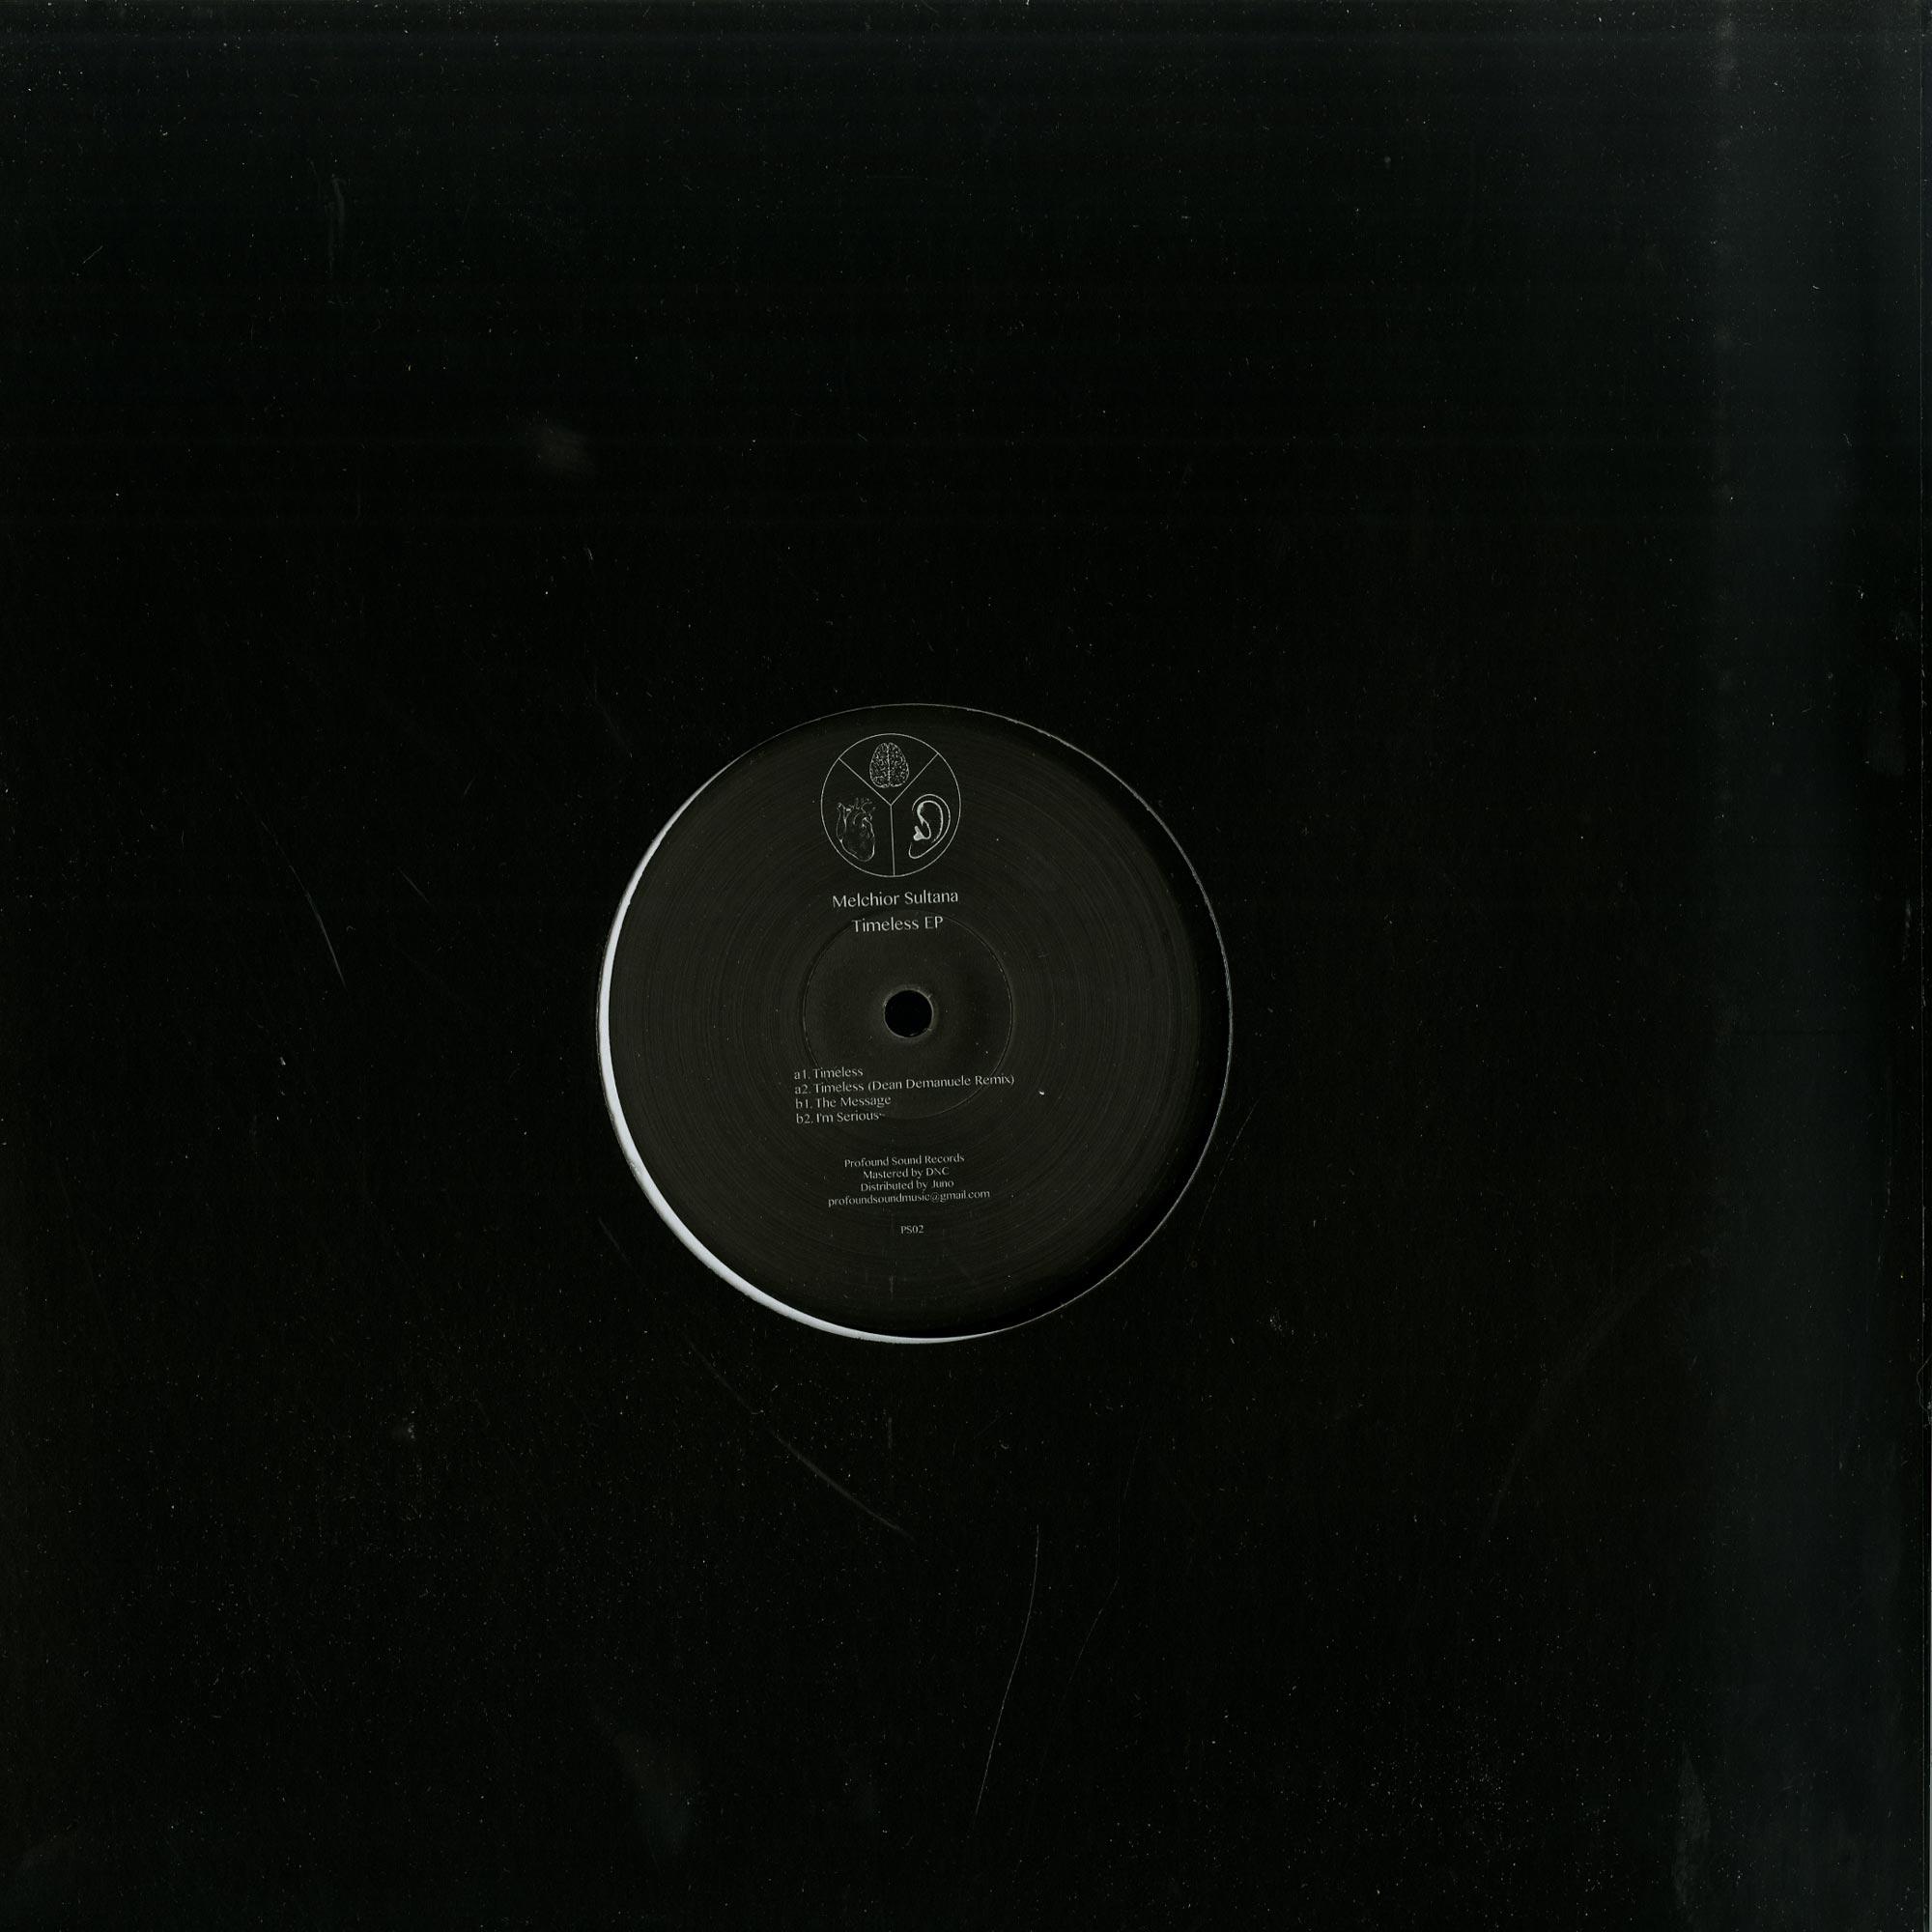 Melchior Sultana - TIMELESS EP